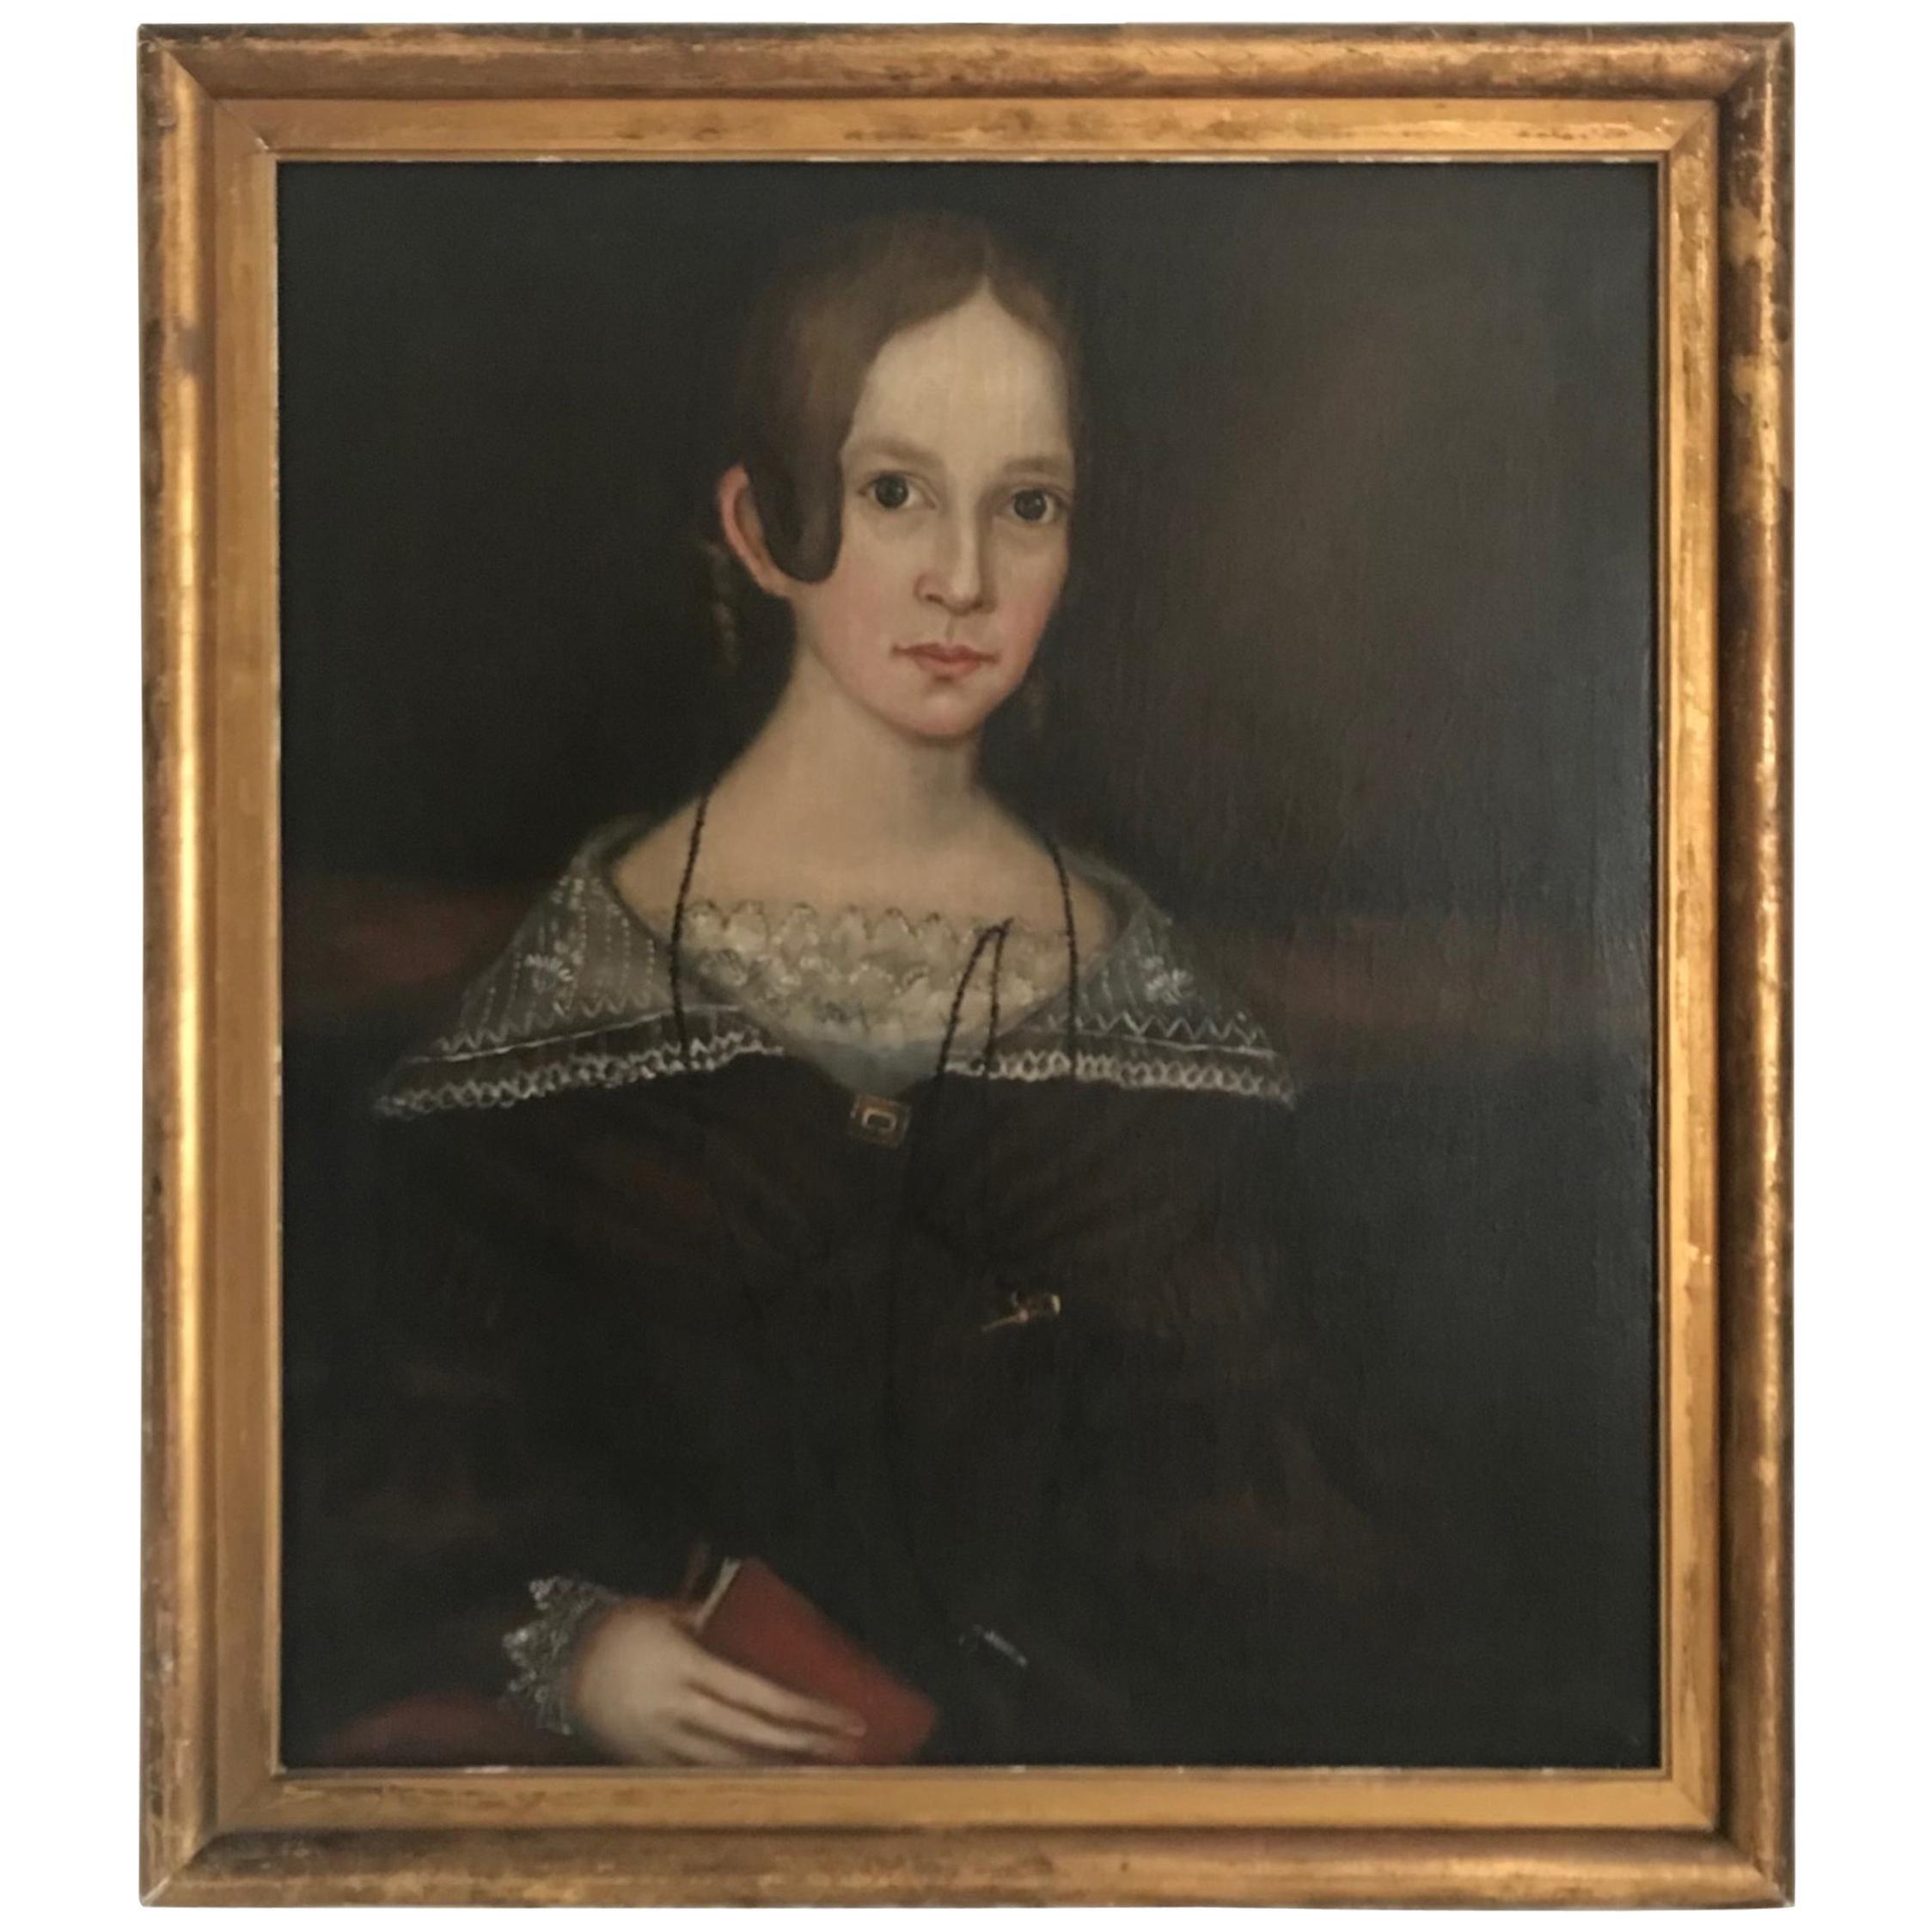 Superb Ammi Phillips American Folk Art Portrait Painting, circa 1840